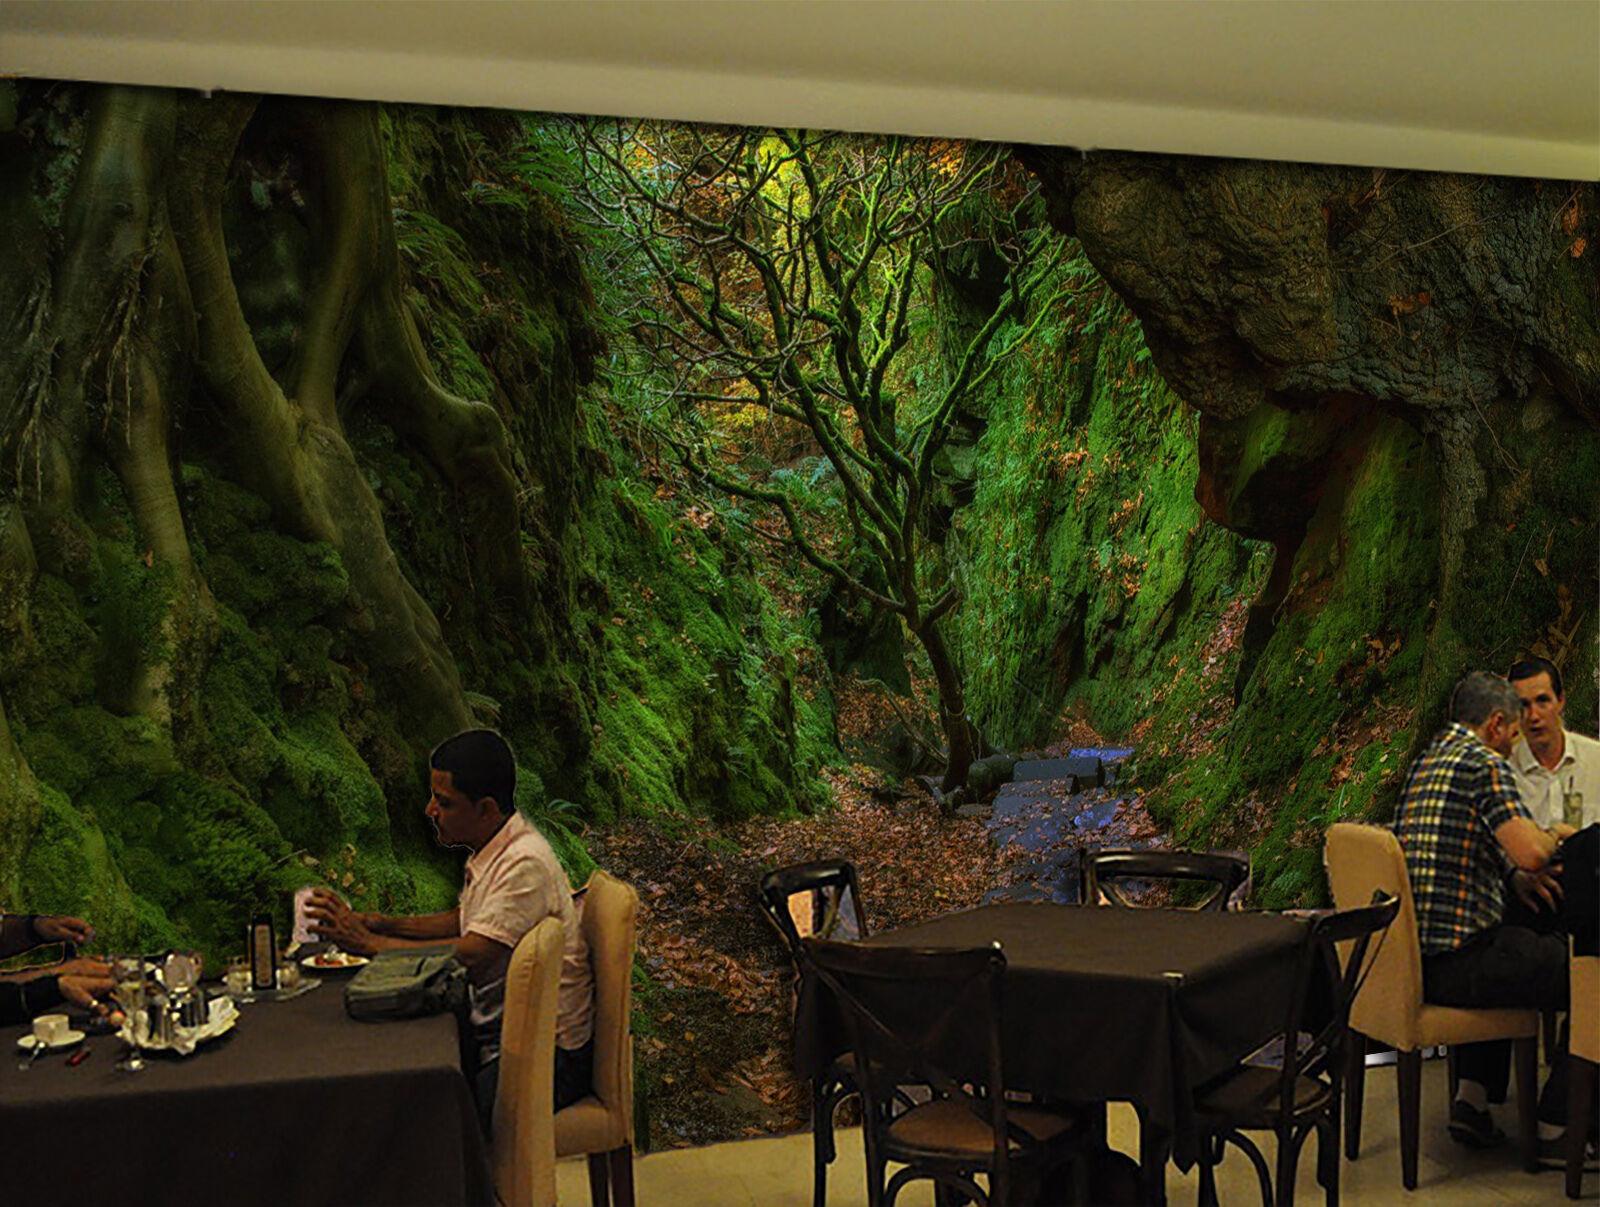 3D Narrow valley 345 Wall Paper Print Wall Decal Deco Indoor Wall Murals